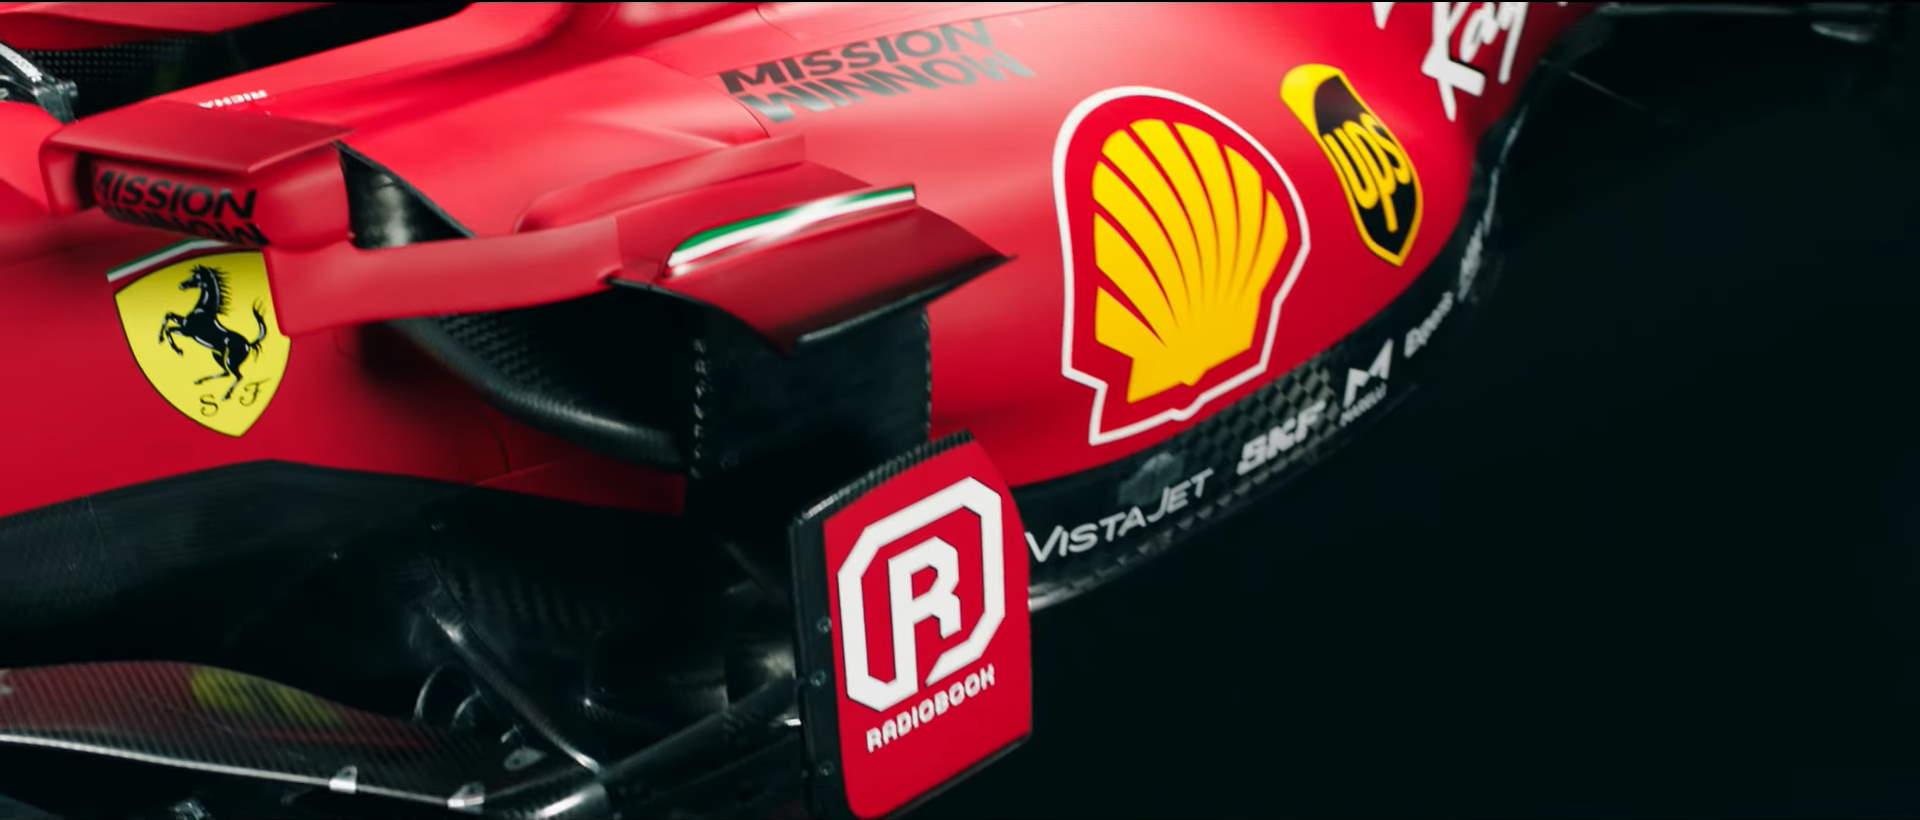 2021 Ferrari SF21 Screenshot Youtube F1 launch sidepod area Photo Ferrari